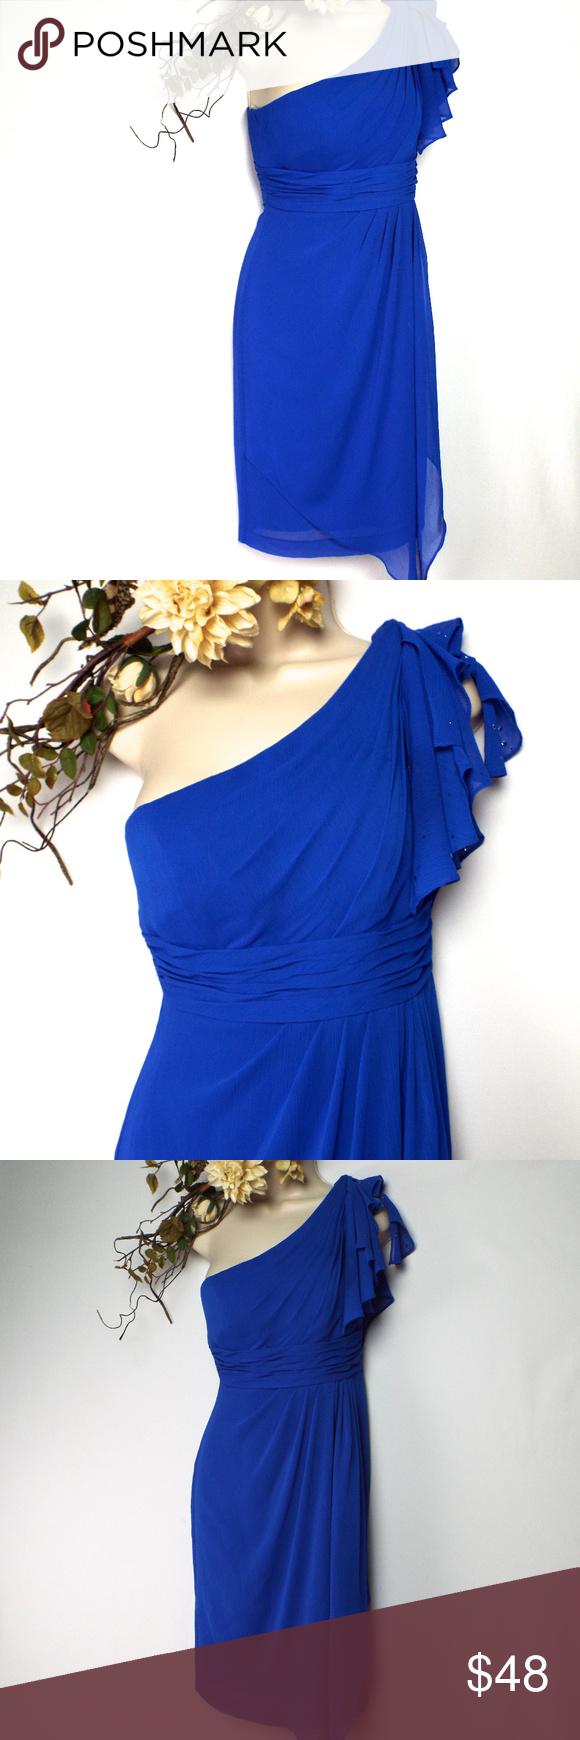 David's Bridal Assymetrical Cold Shoulder Dress EUC Laid